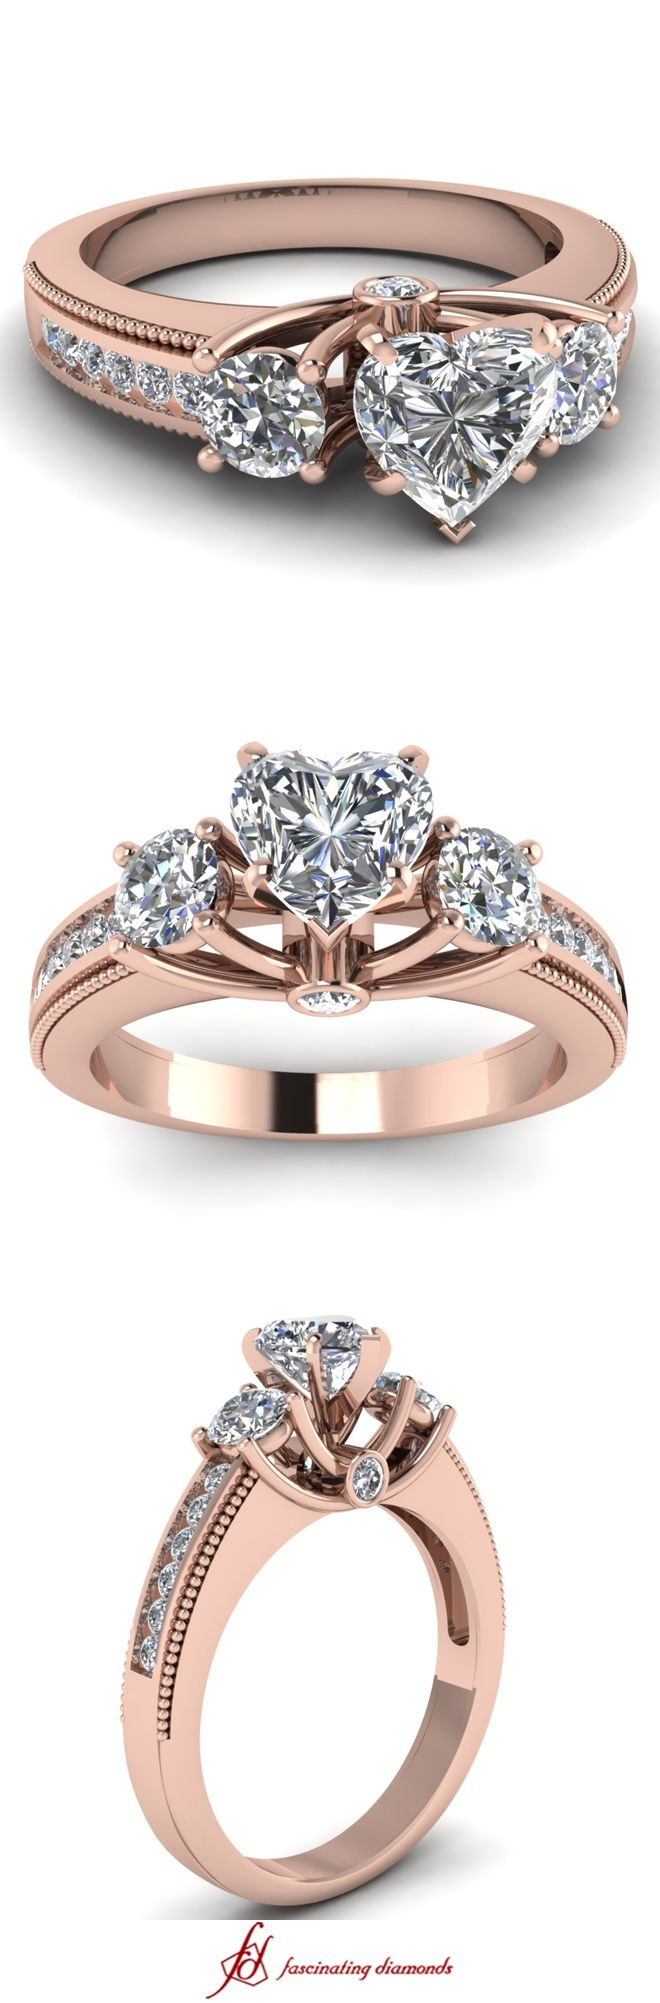 Milgrain Pattern Ring || Heart Shaped Diamond Side Stone Ring With White Diamond In 14K Rose Gold...MINE!